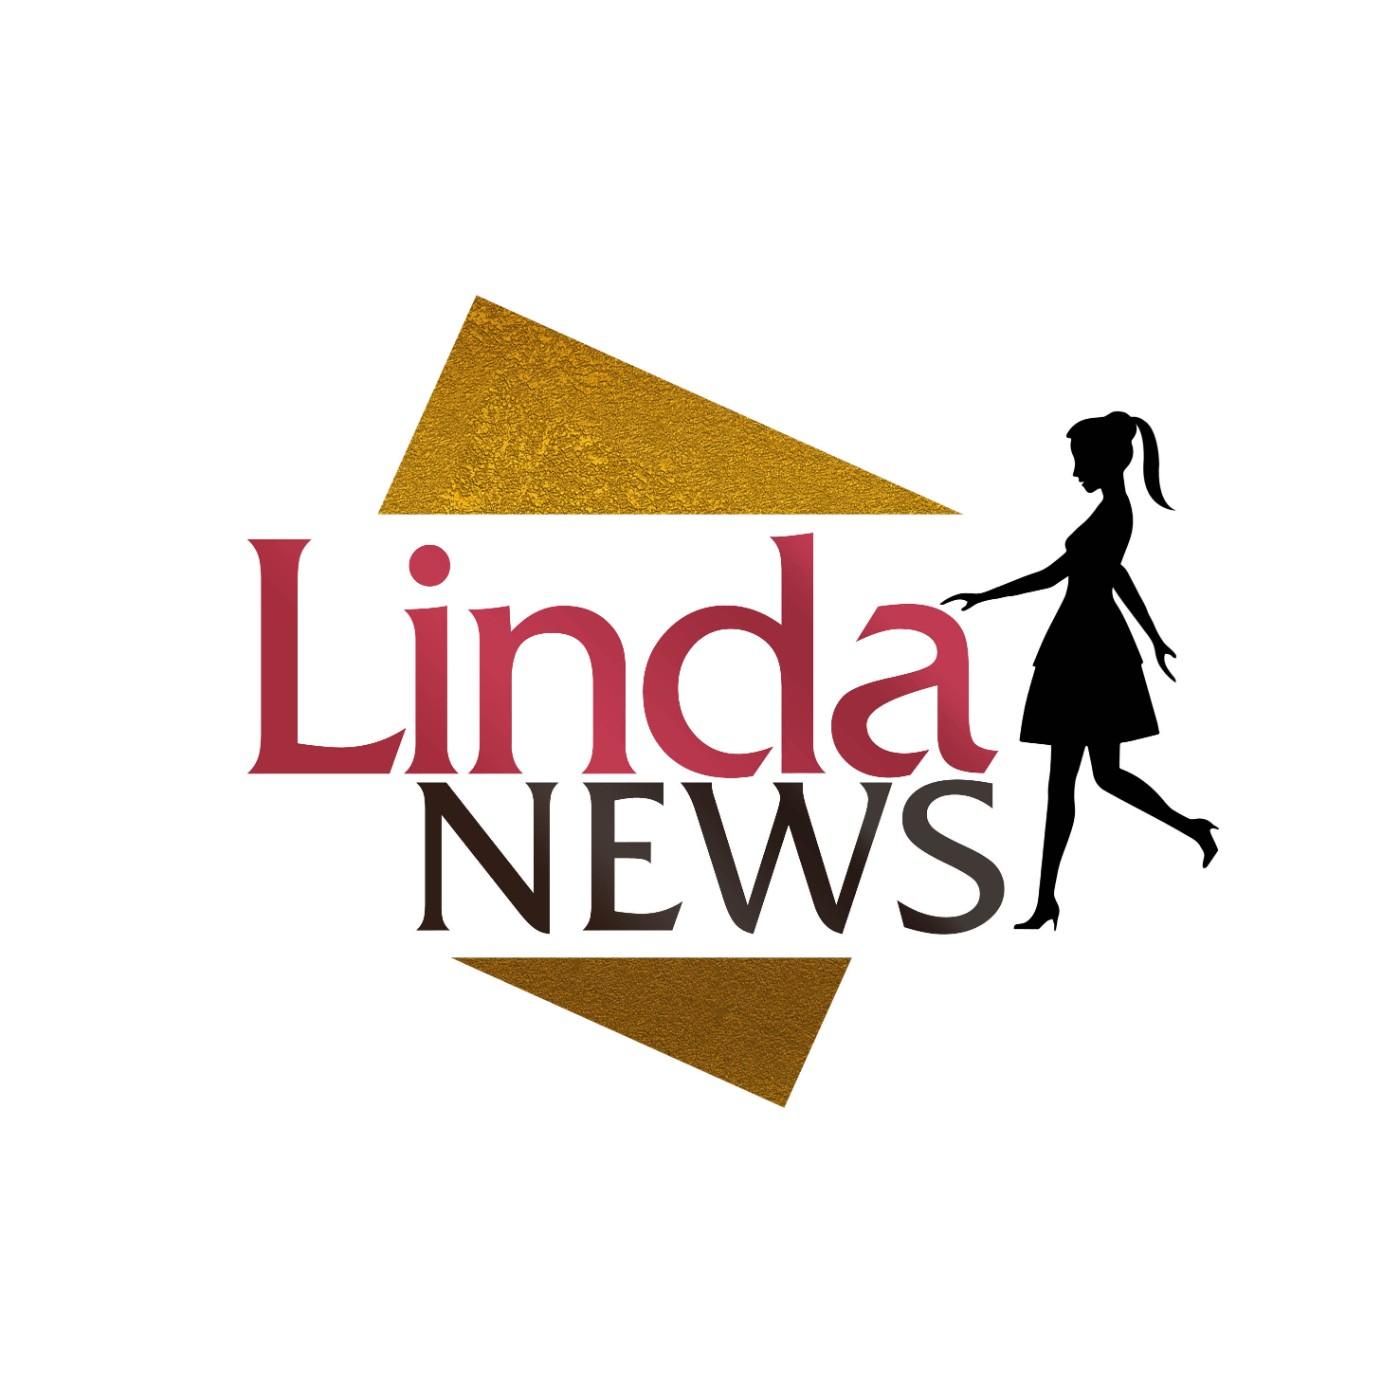 【LINDA NEWS 最錢線】2021/05/31 傳產電子齊揚 台股再站萬七 GMoney